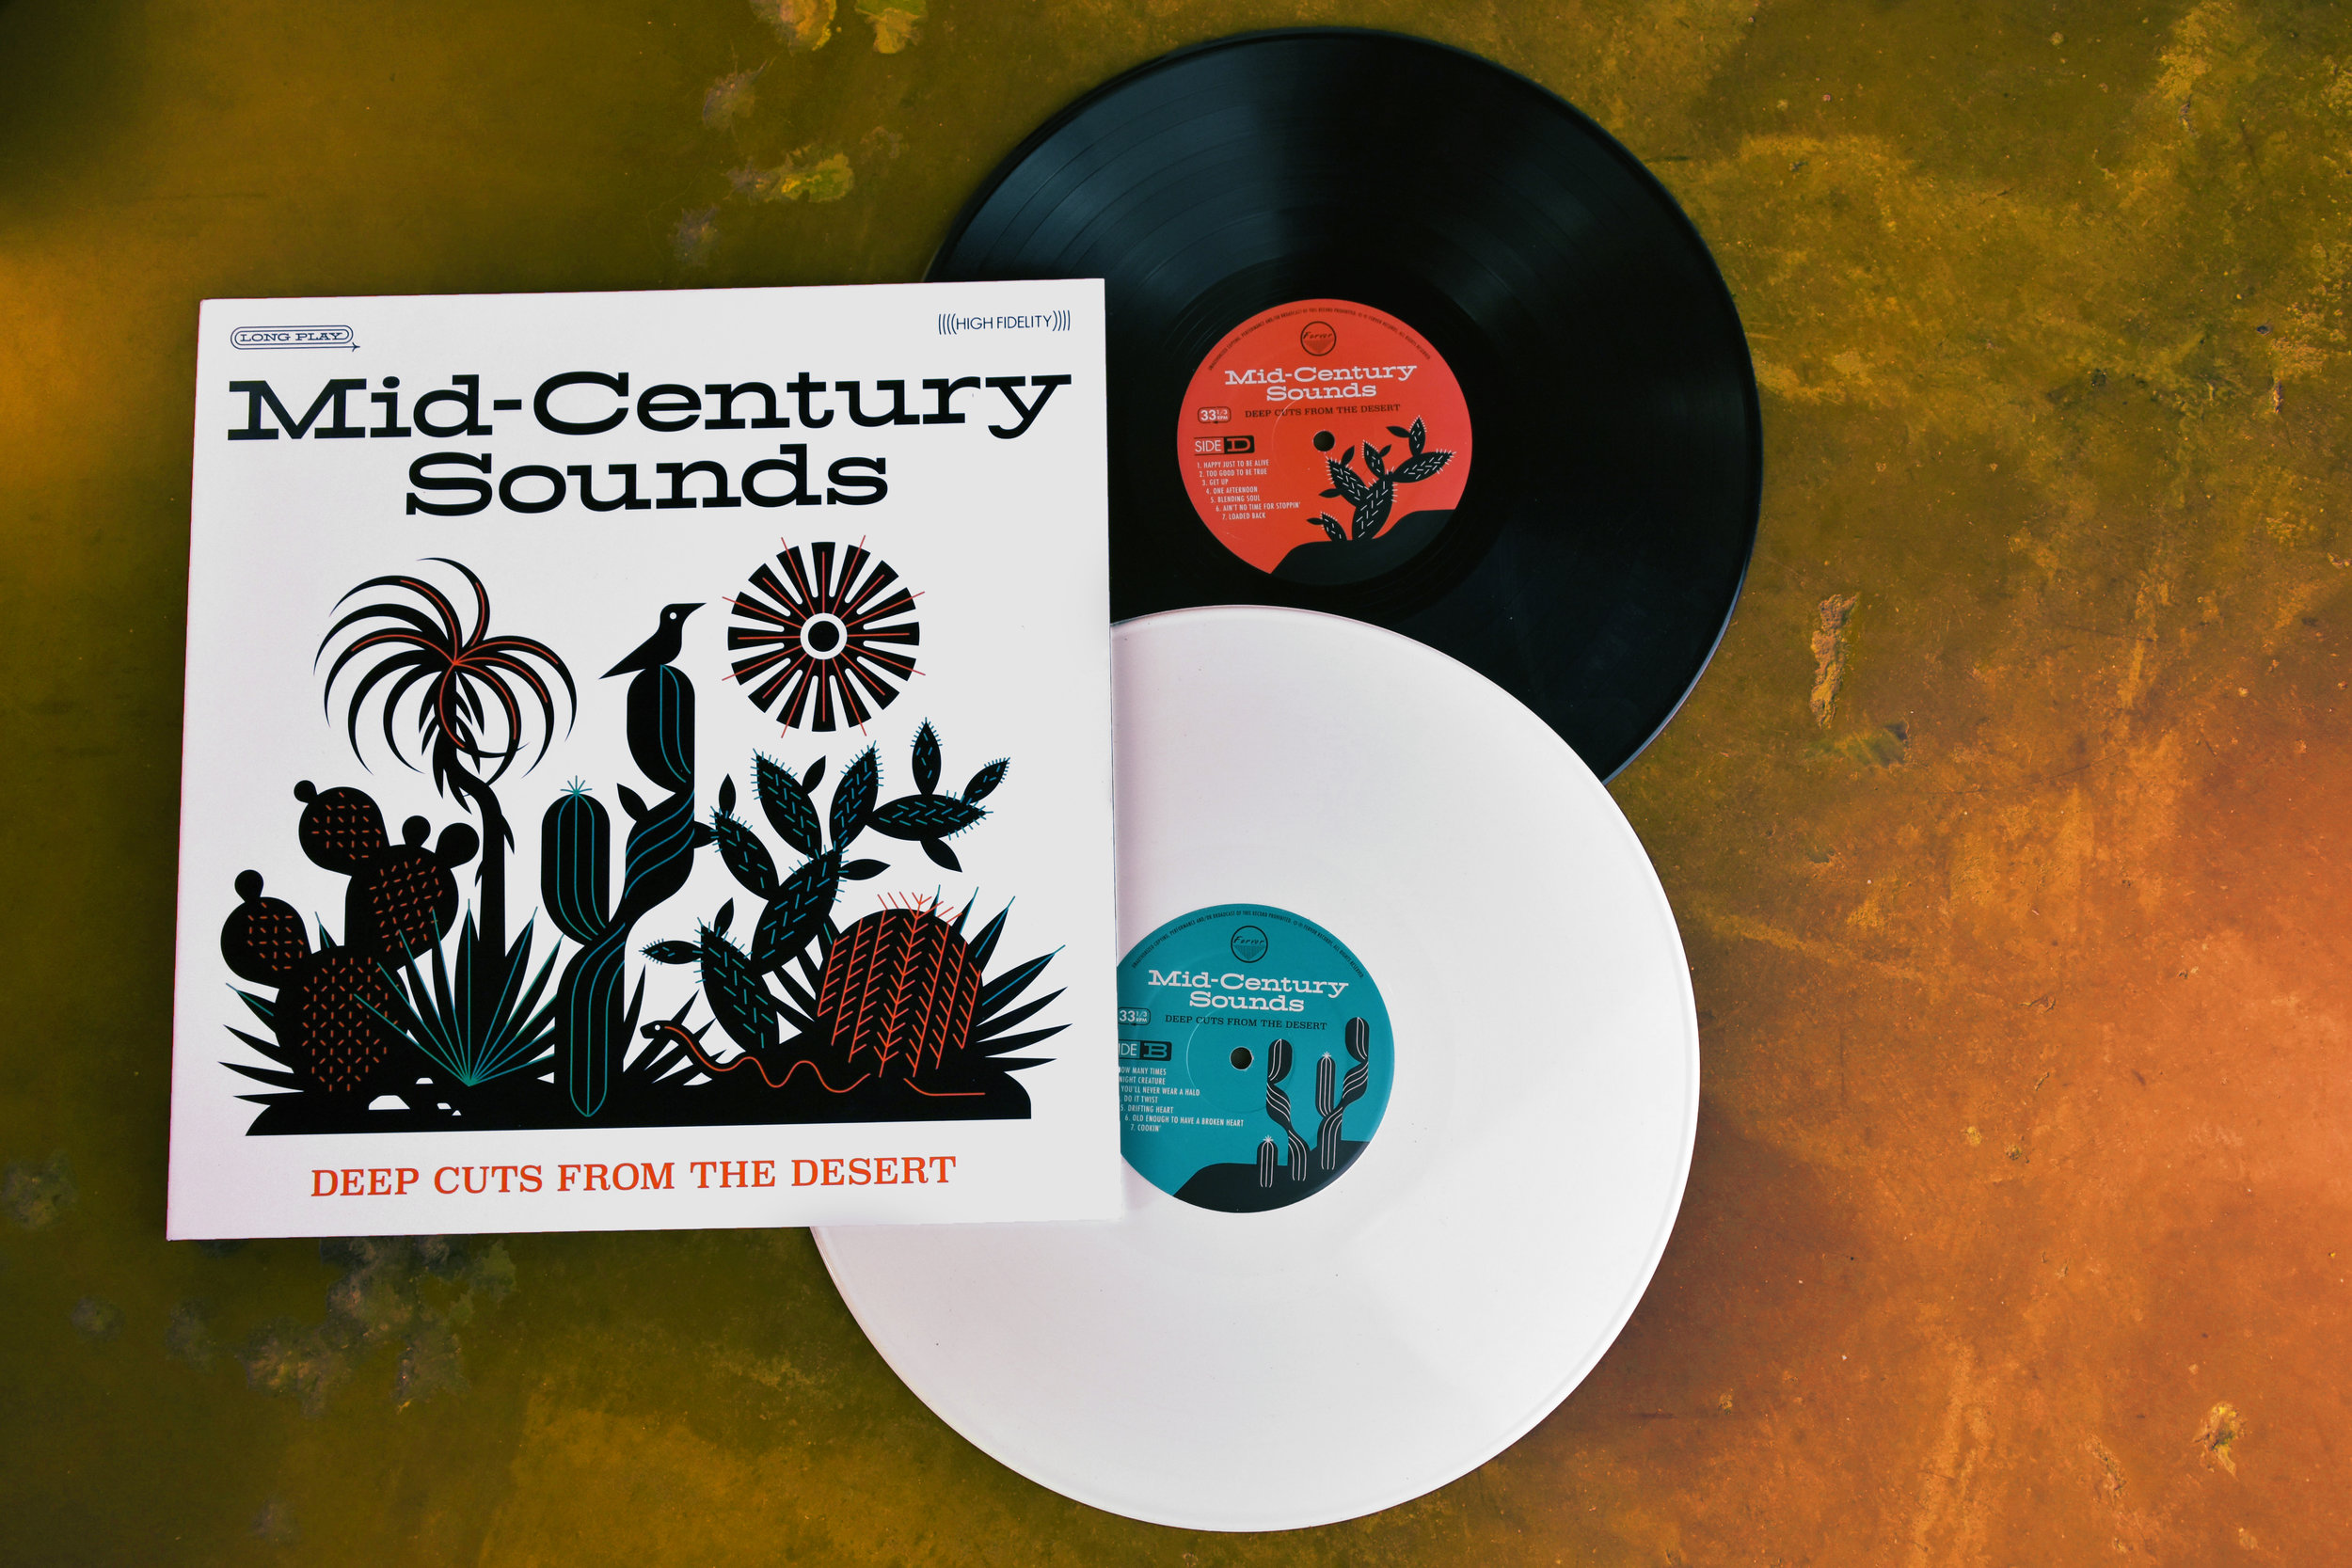 Mid Century Sounds Vinyl Promo 3.jpg